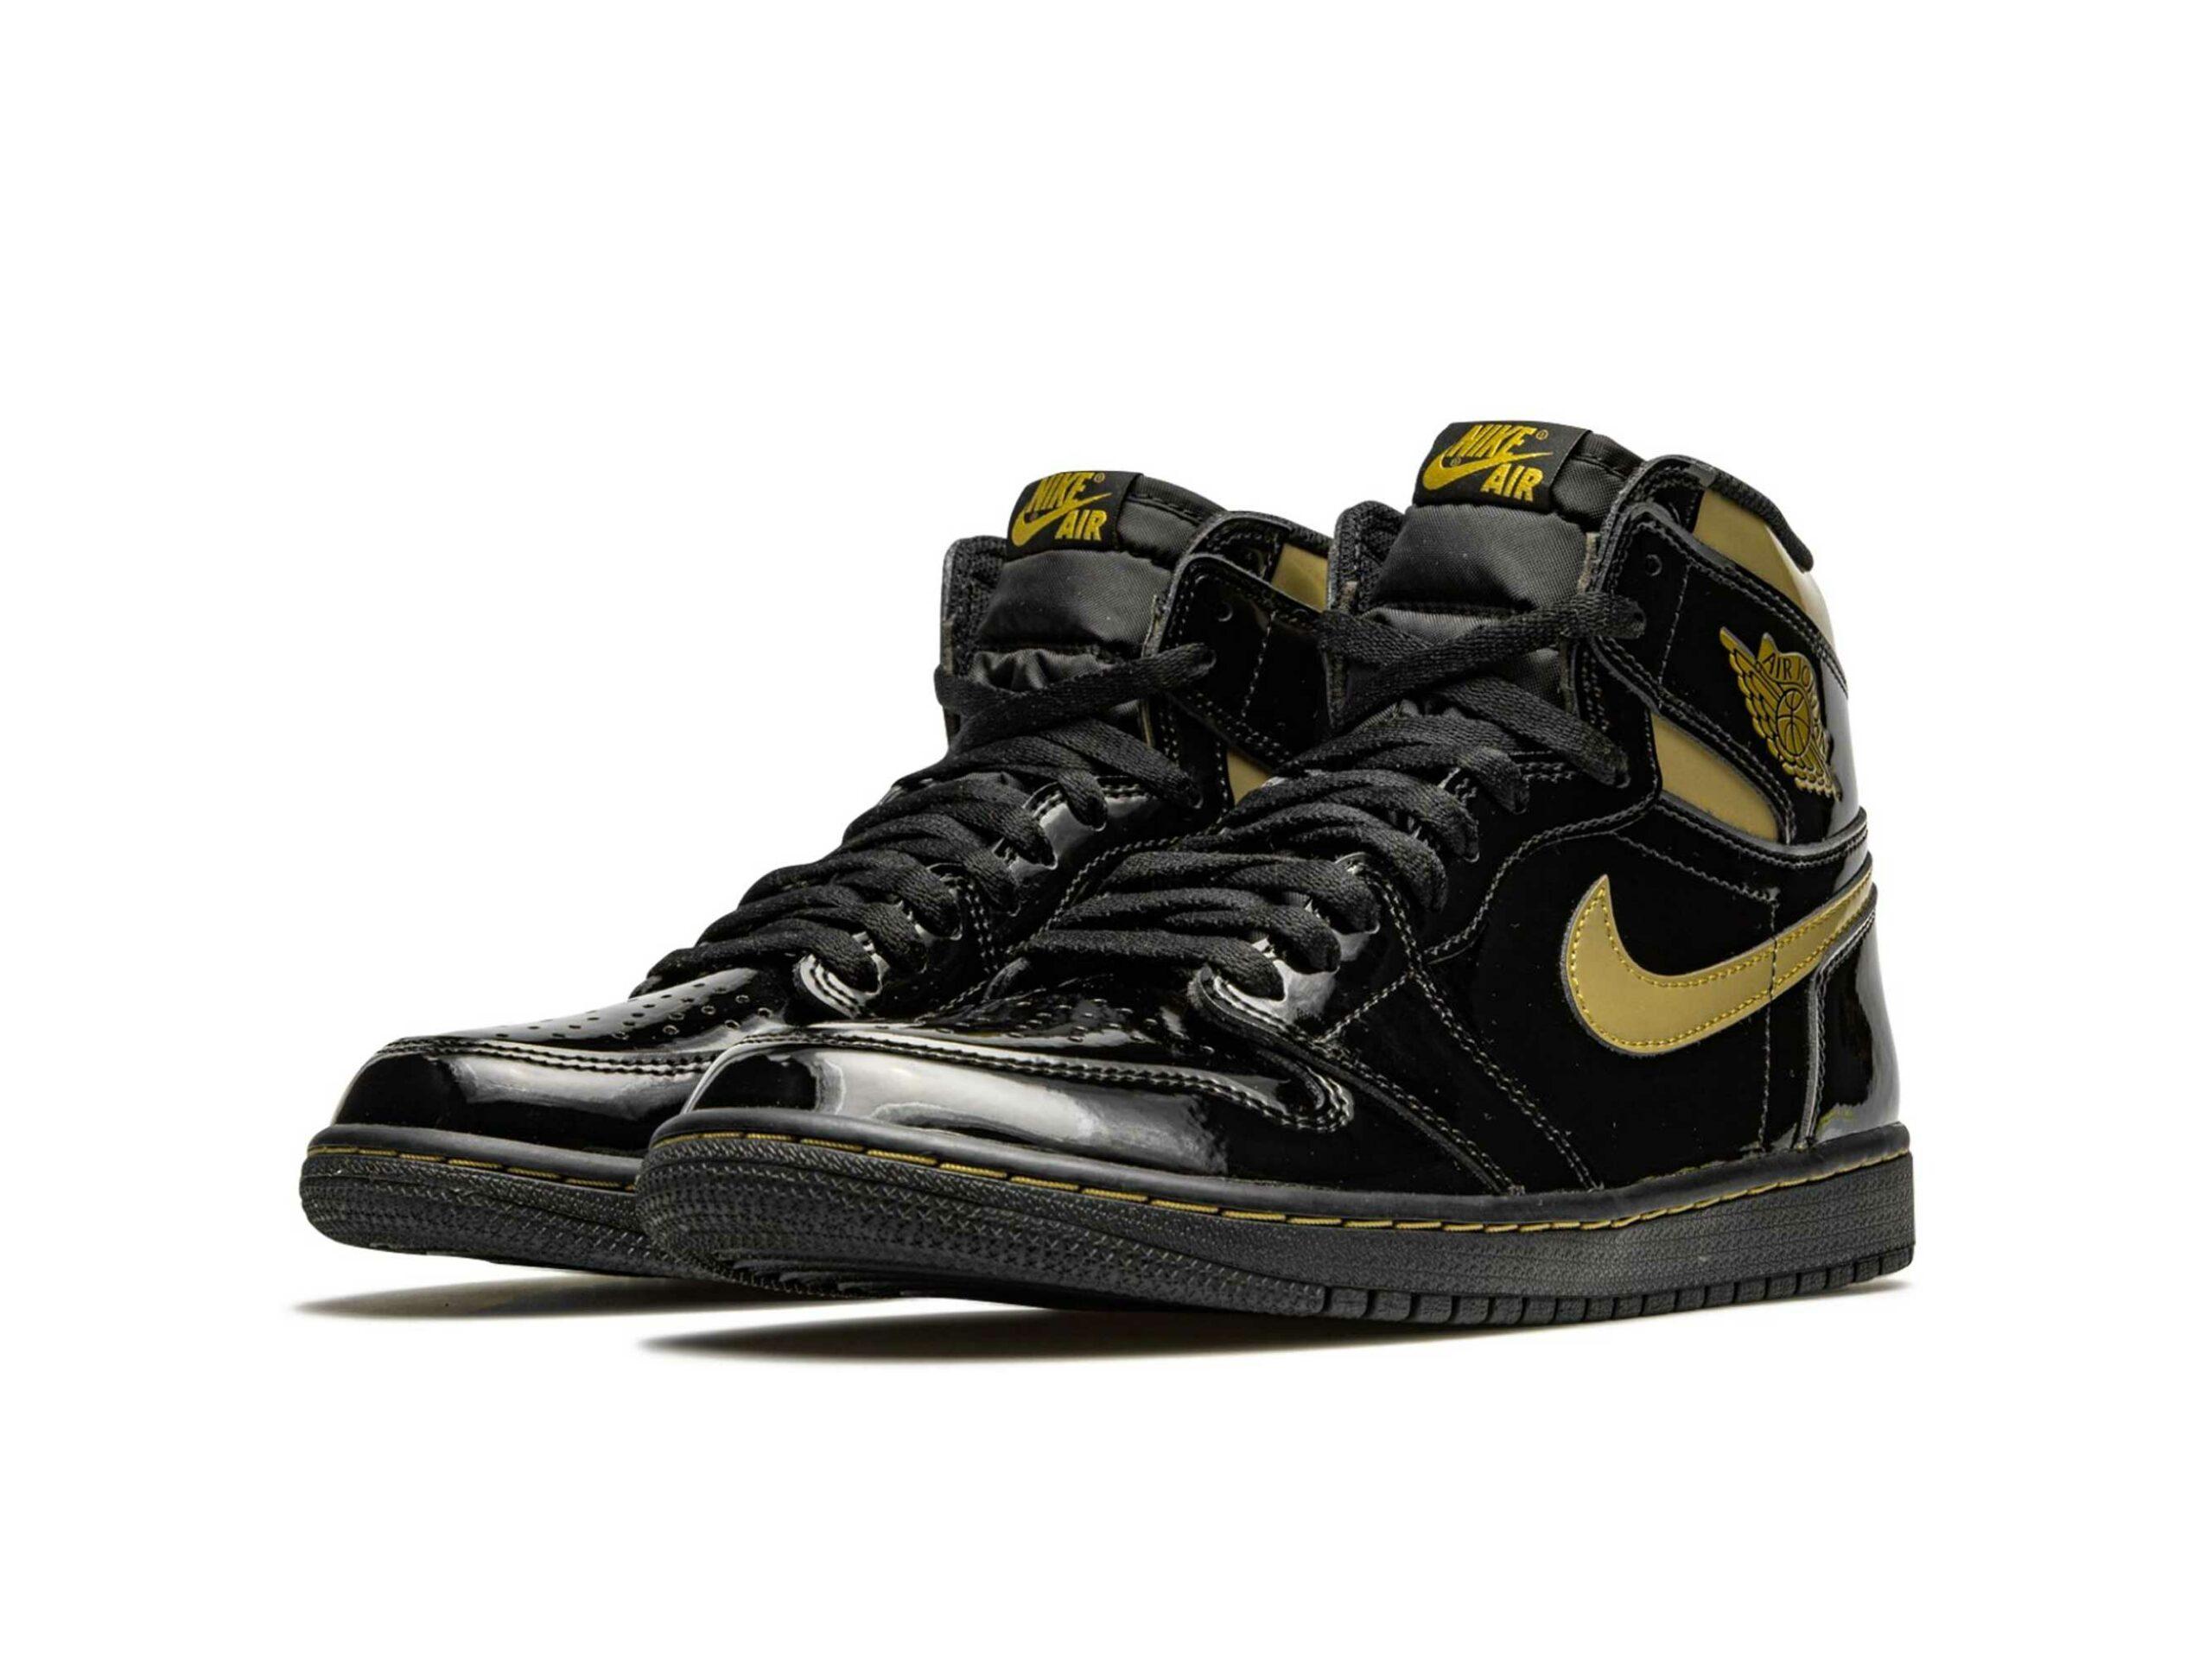 nike air Jordan 1 retro high og black metallic gold 555088_032 купить